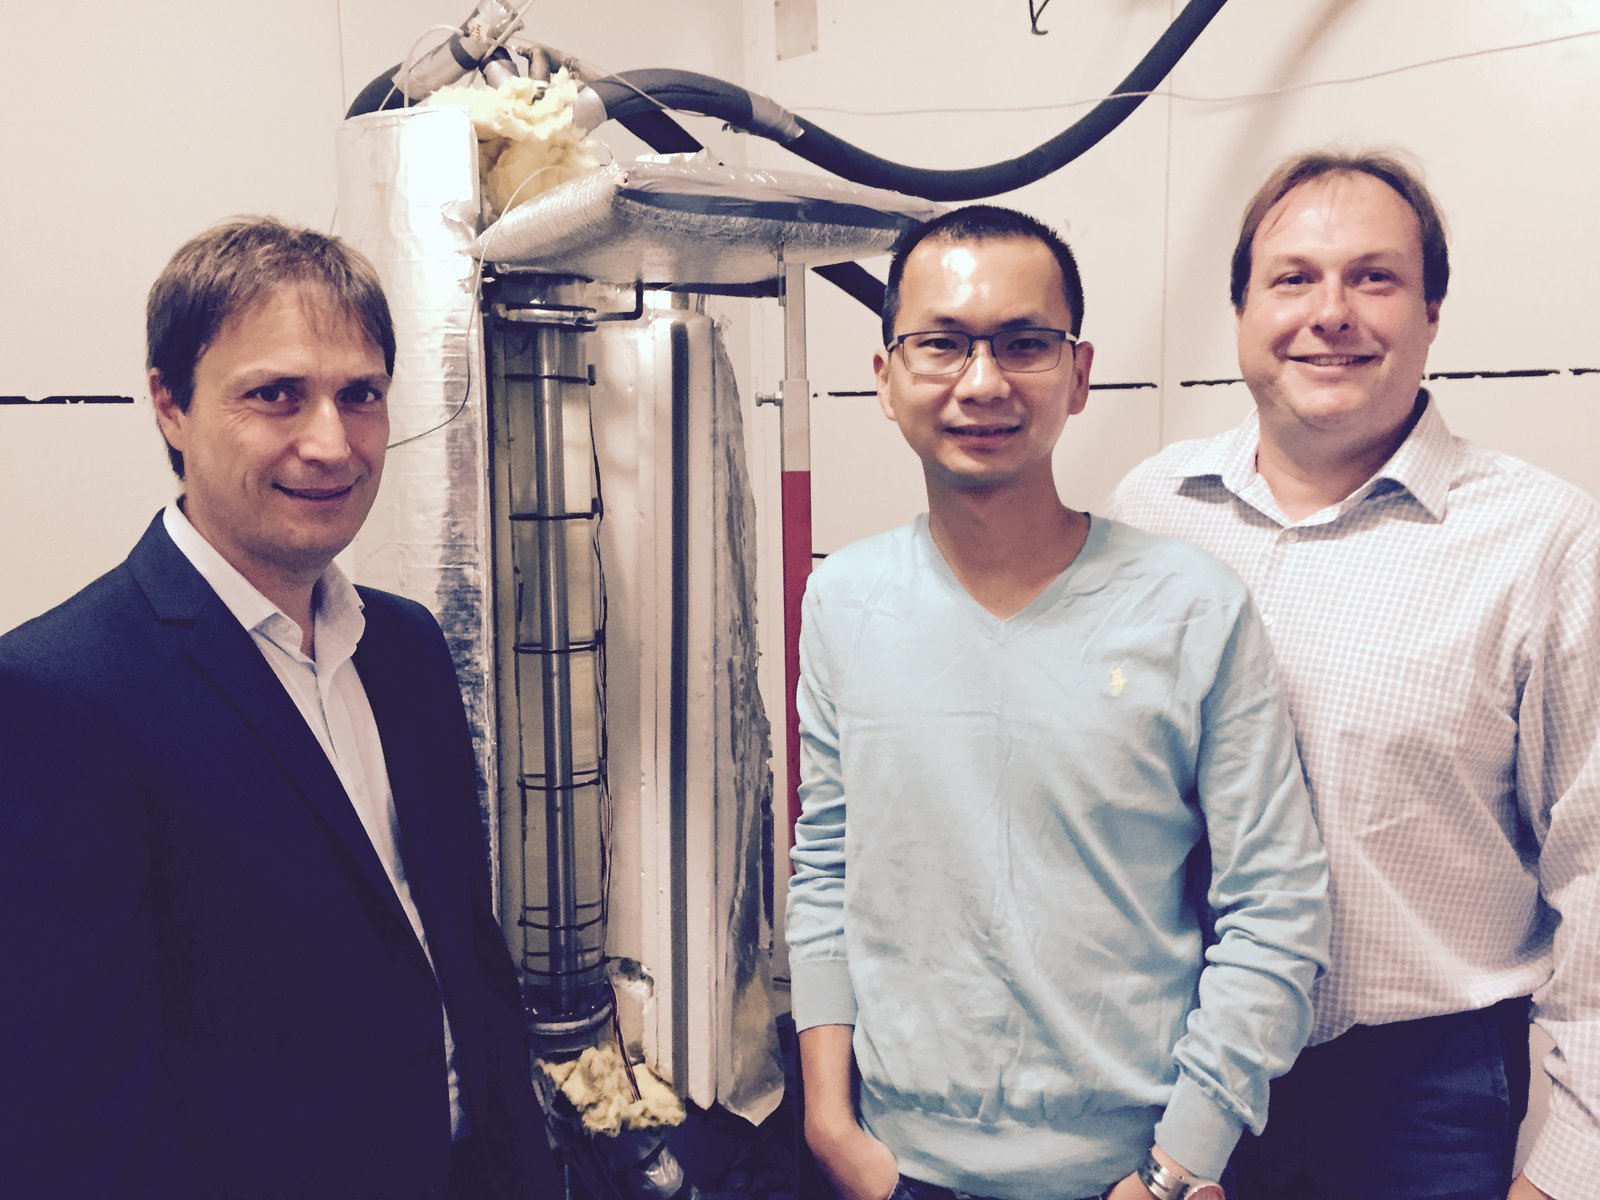 Associate Professor Frank Bruno, Dr Martin Belusko and Dr Steven Tay